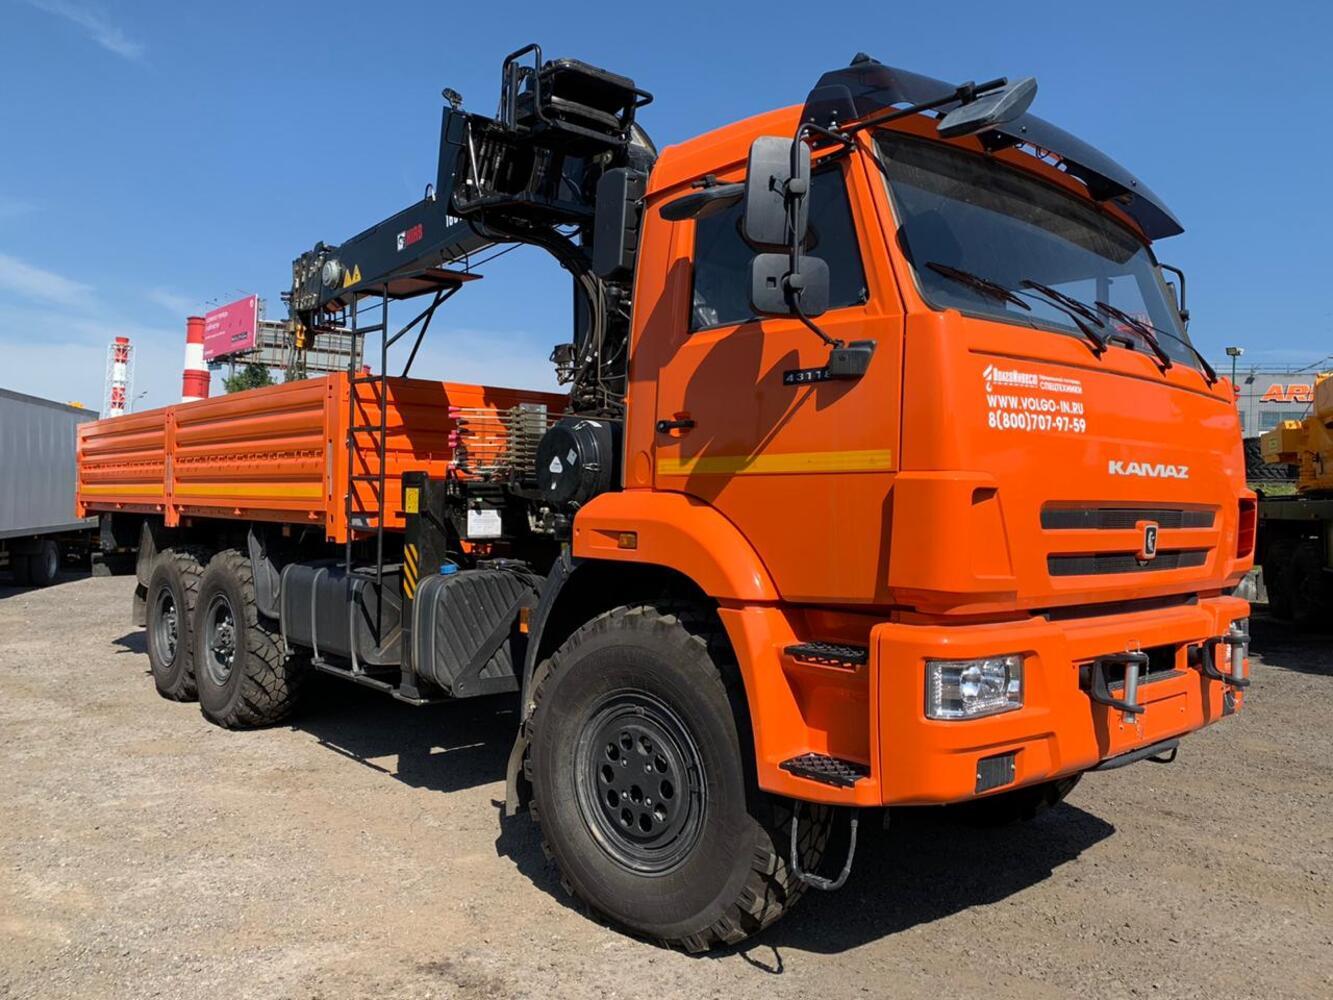 Продается КАМАЗ-43118 с КМУ hiab 160TM-6